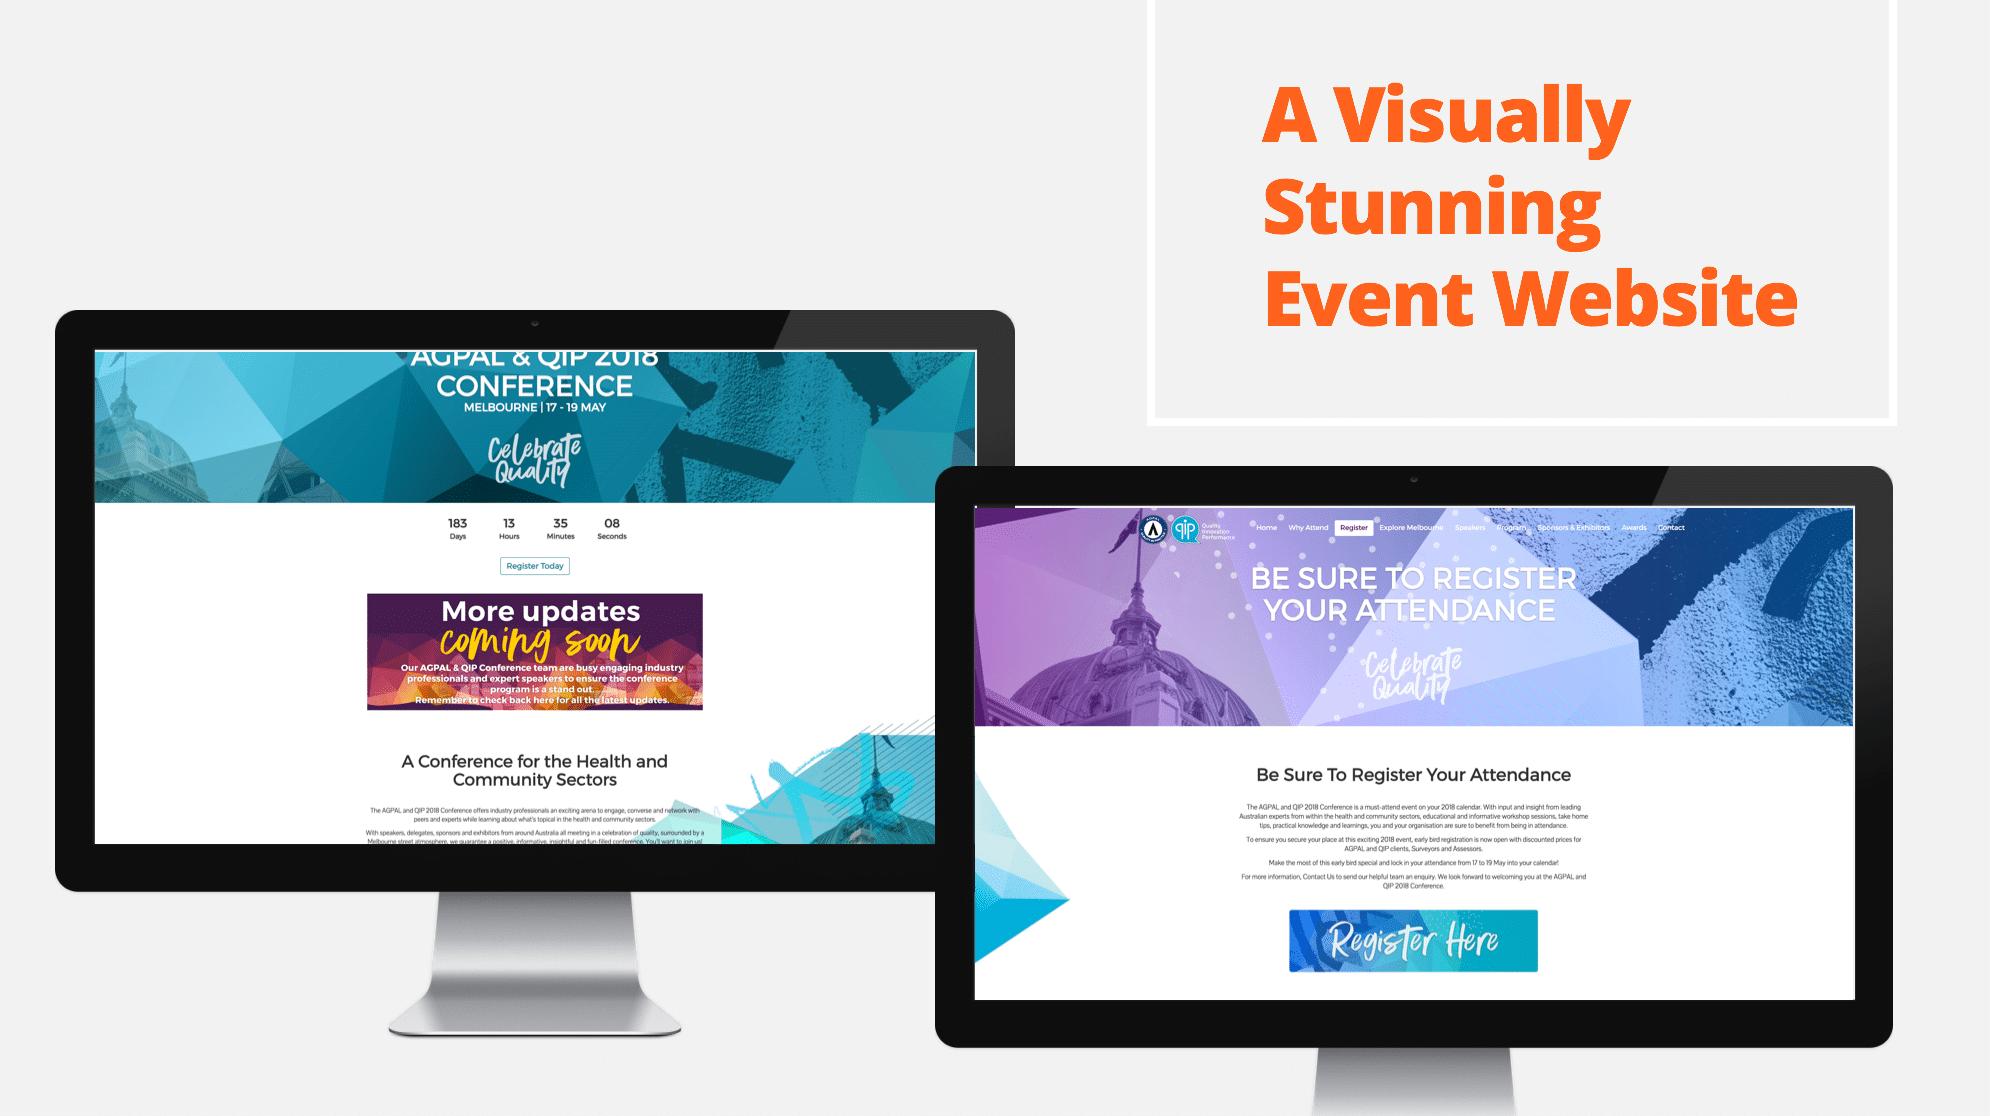 Conference website design GP accreditation